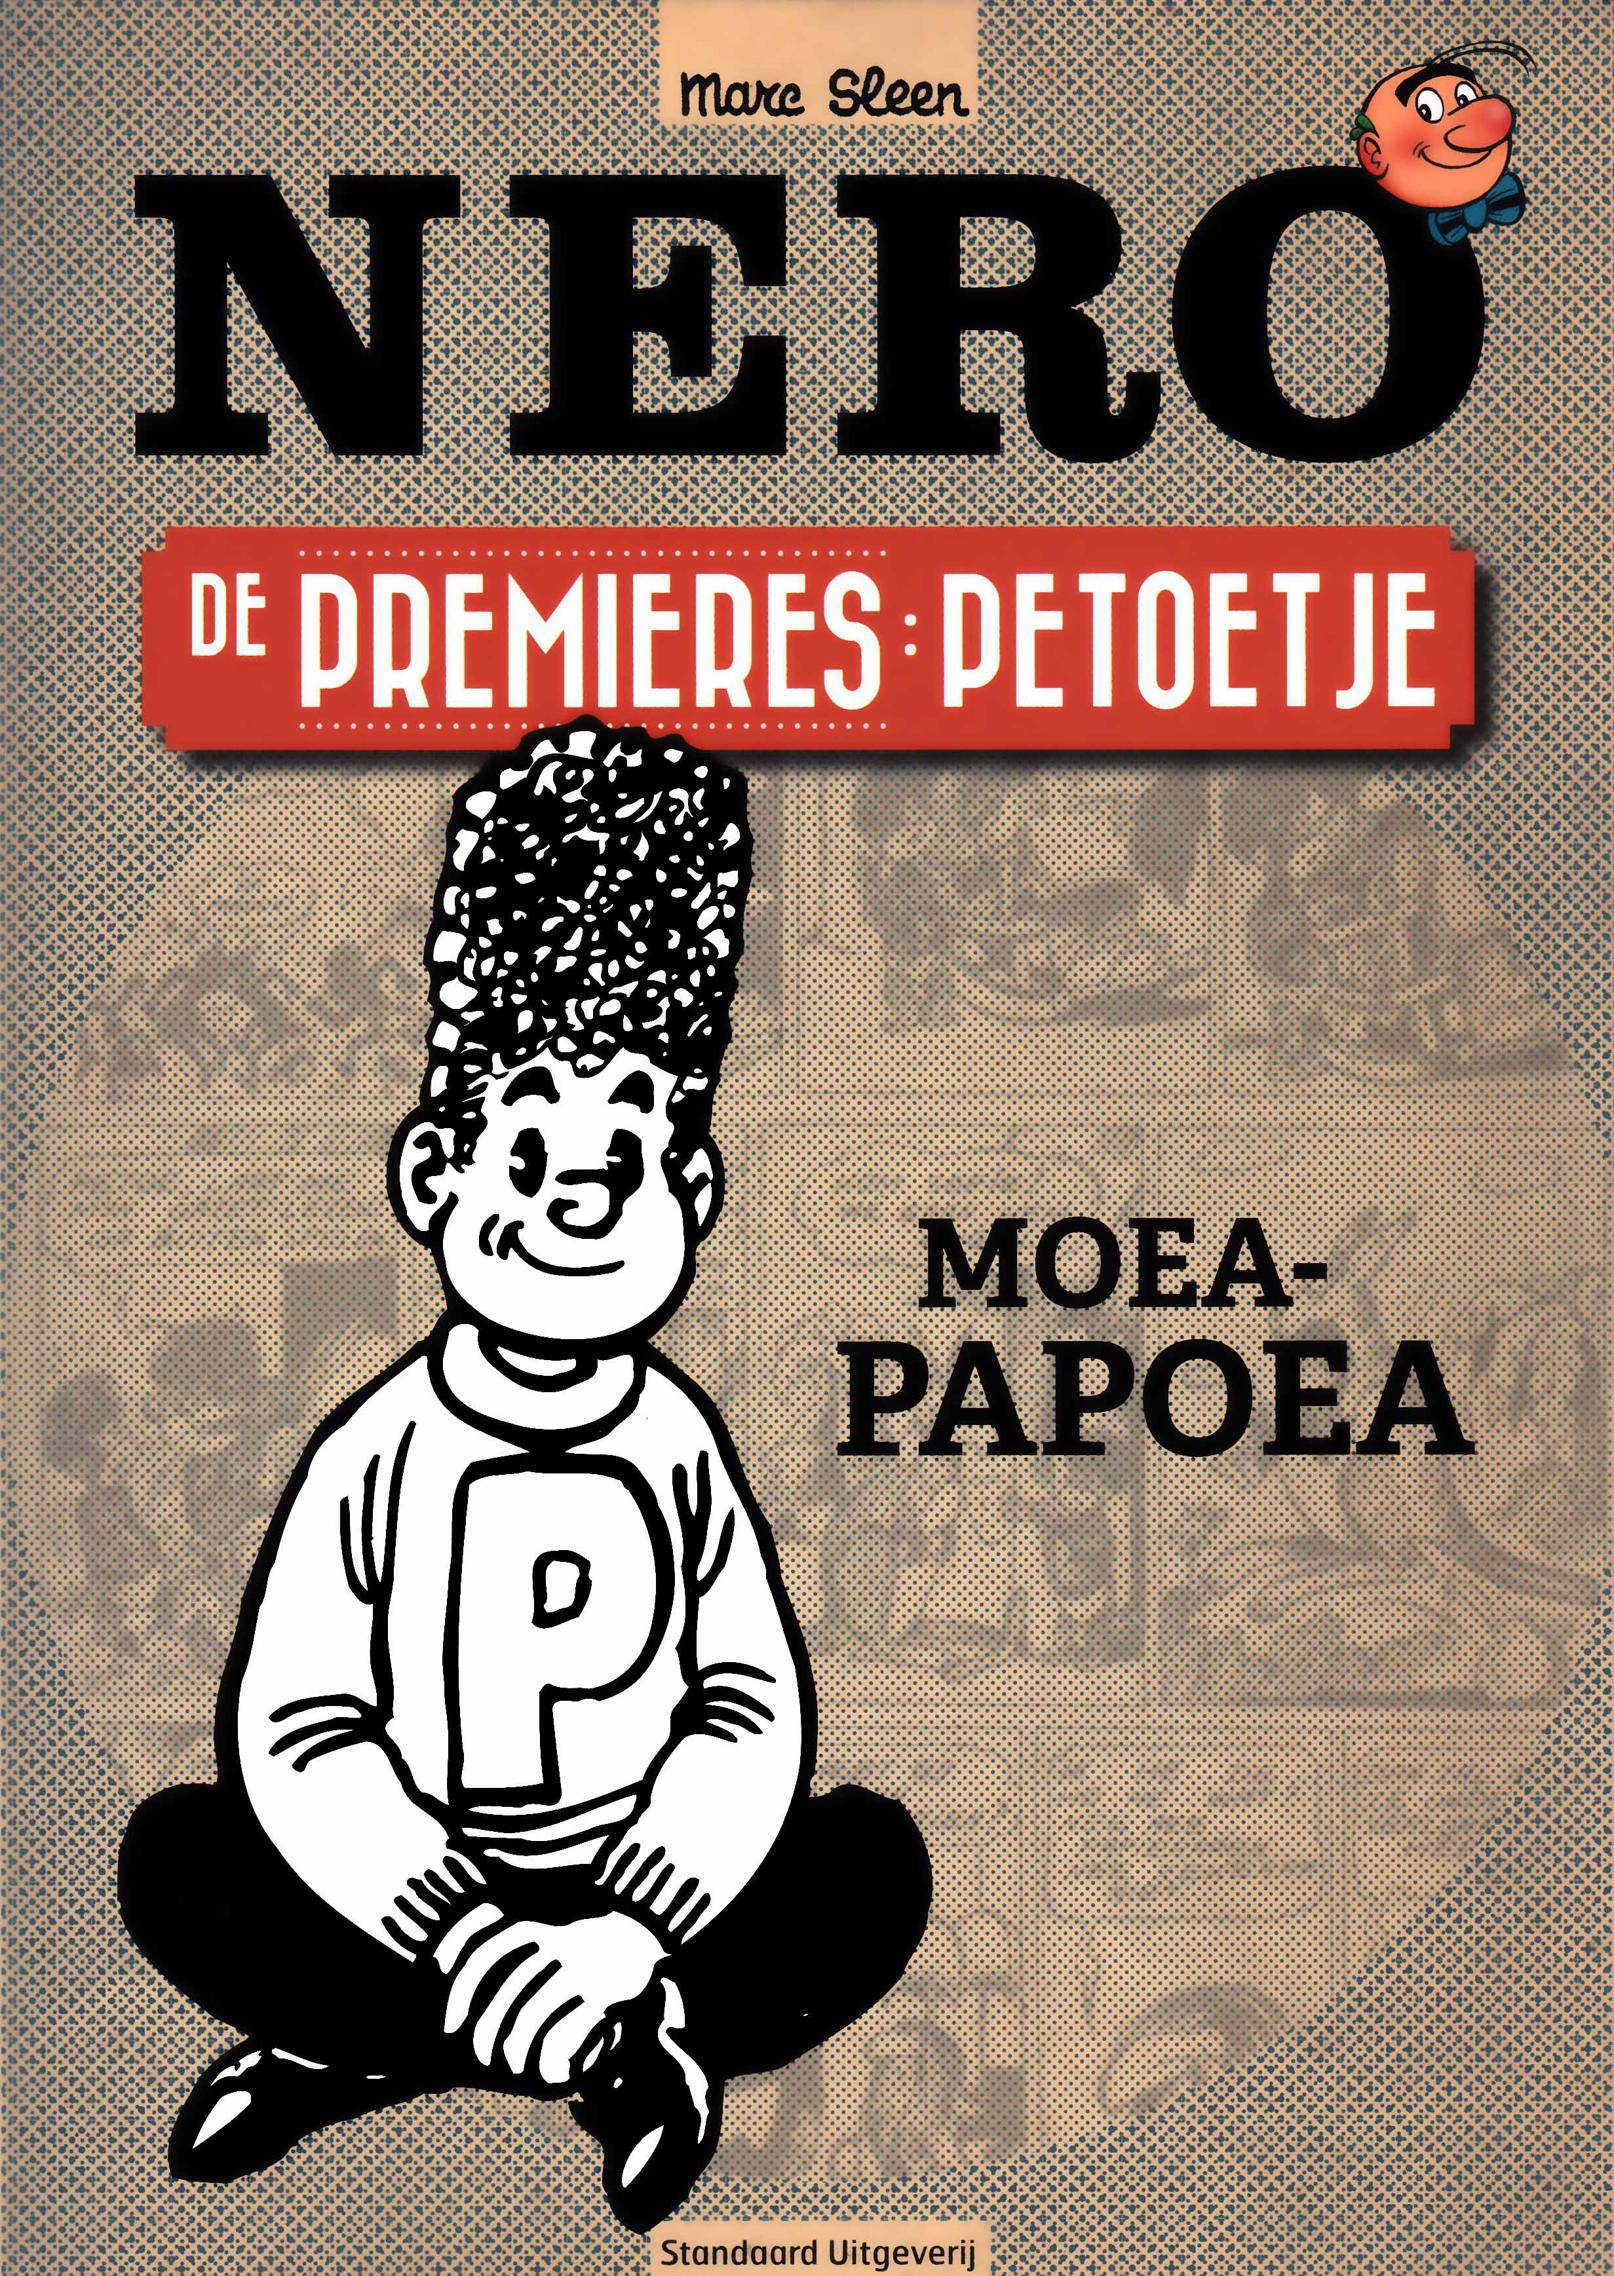 Nero De Premires - 01 - Petoetje -- Moea-Papoea